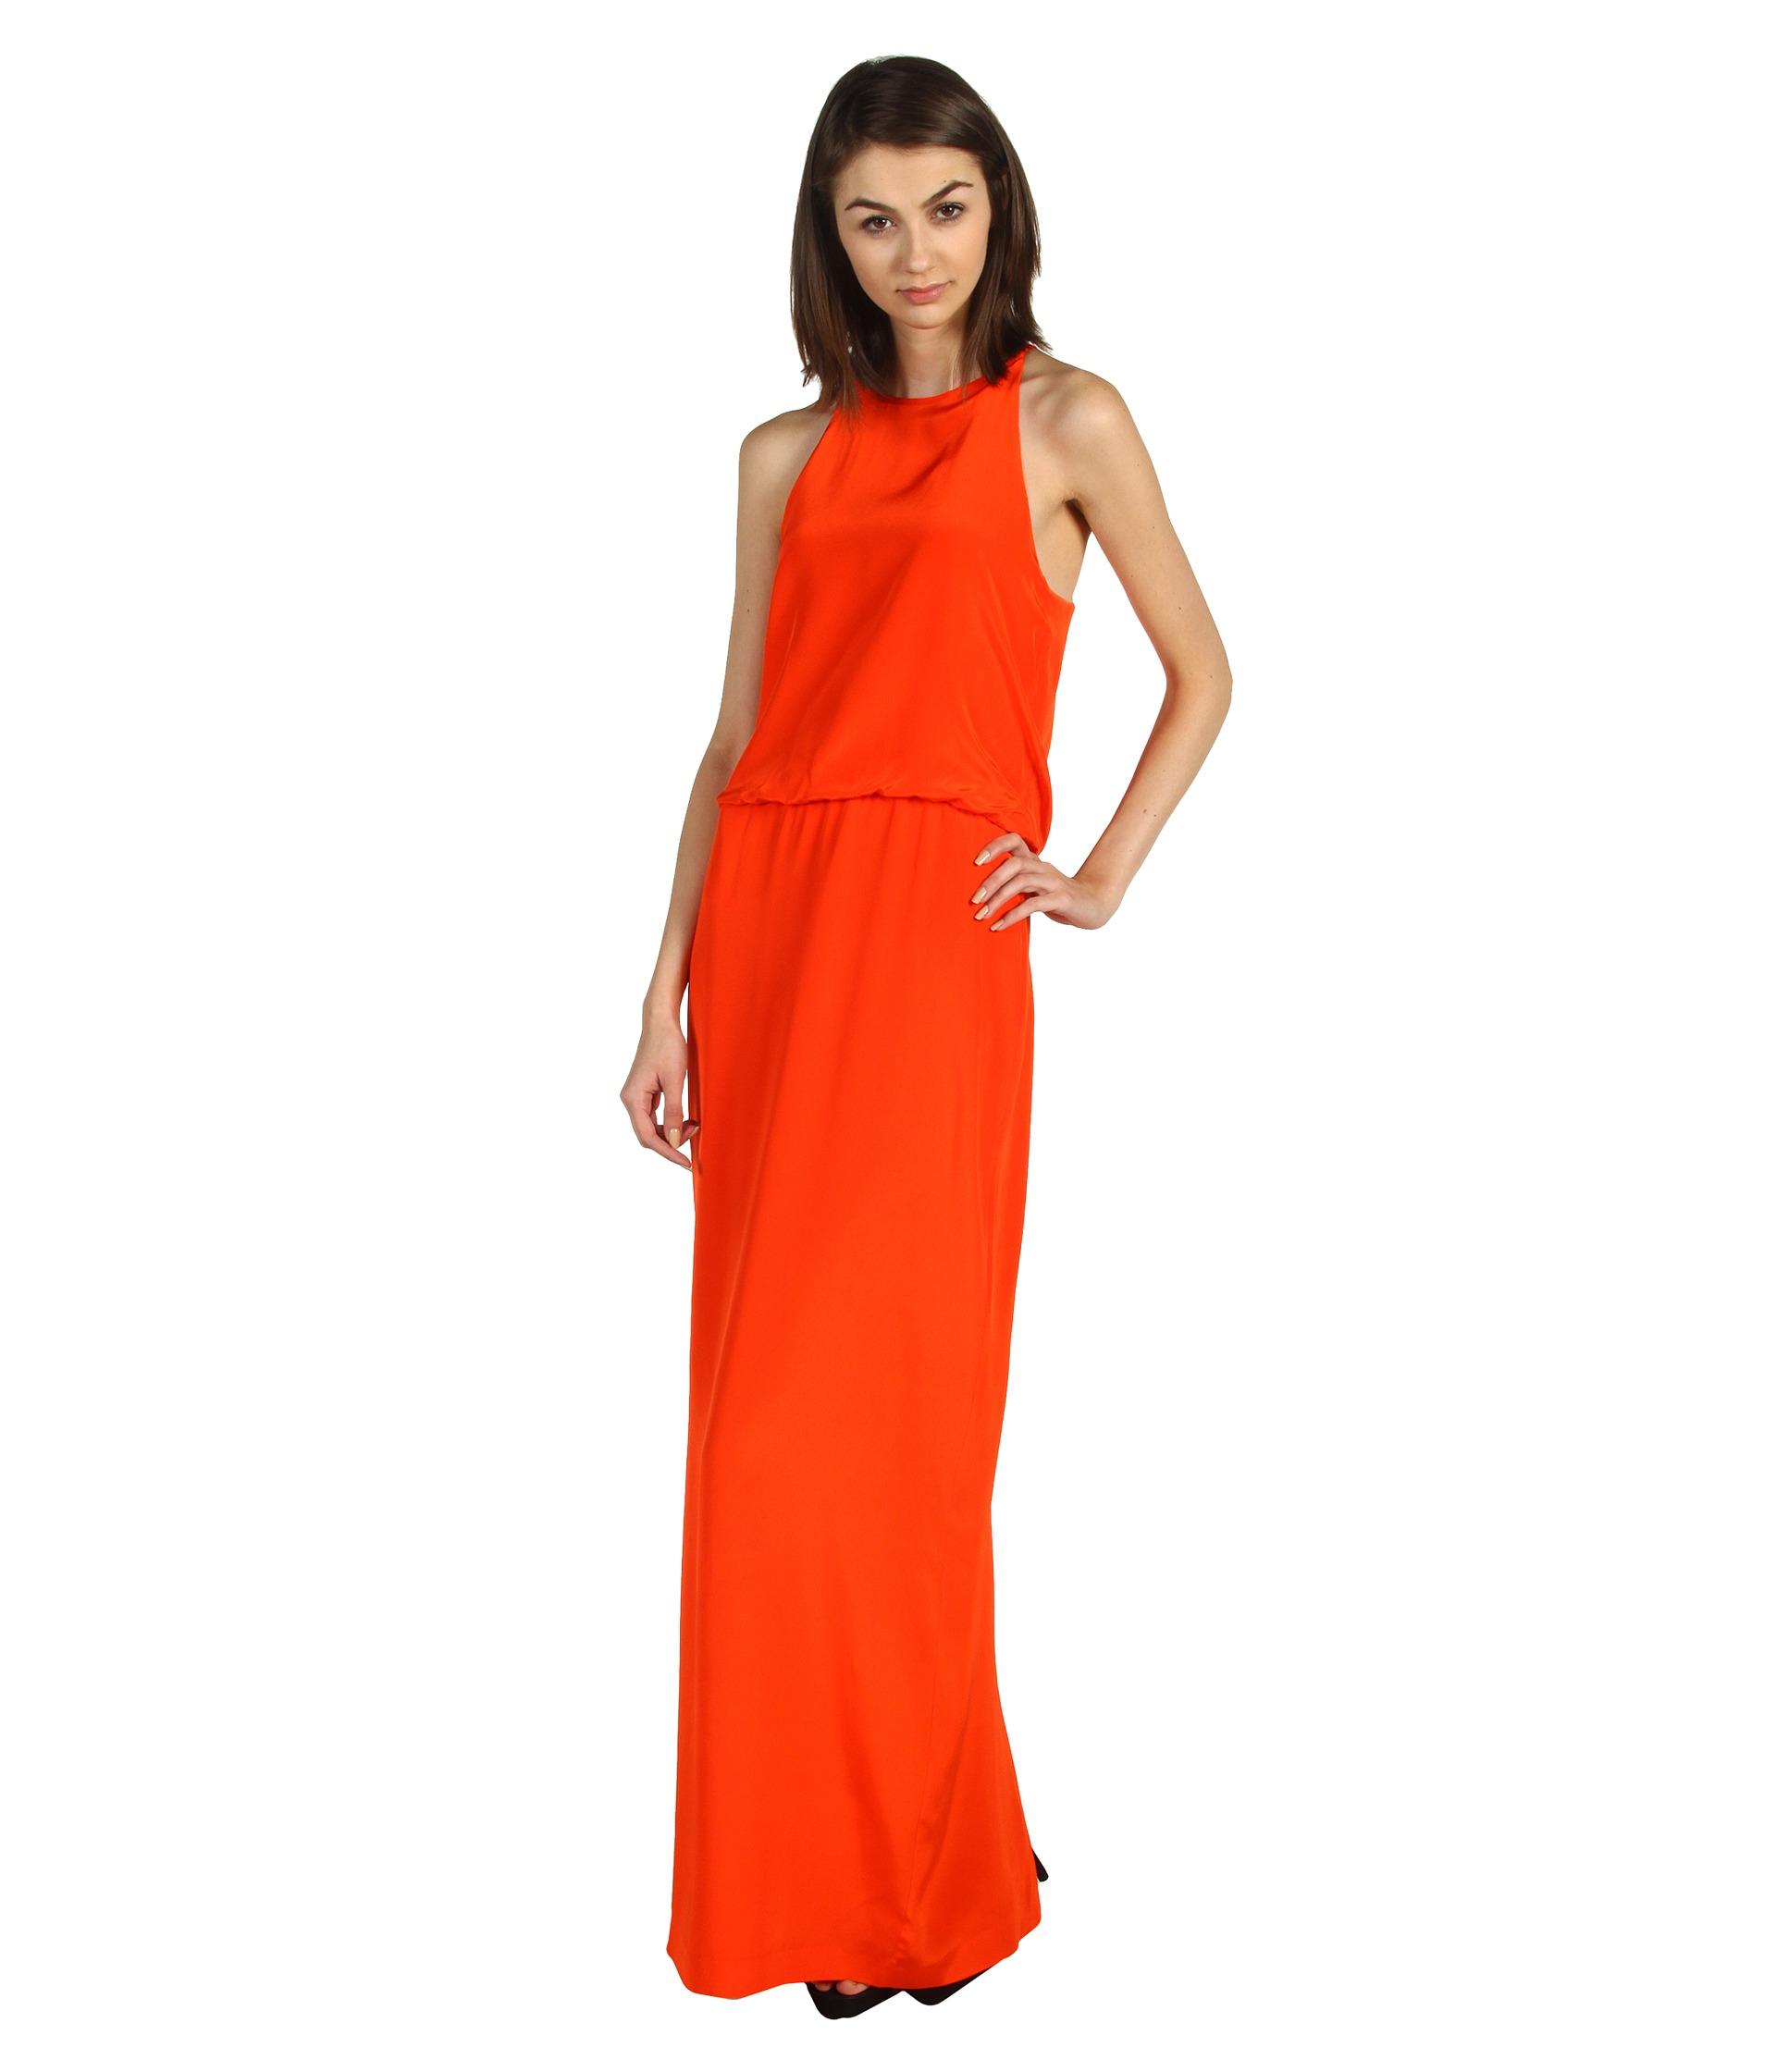 Tommy Bahama Tambour Knotted Long Dress $158.00 Tibi Long Halter Dress